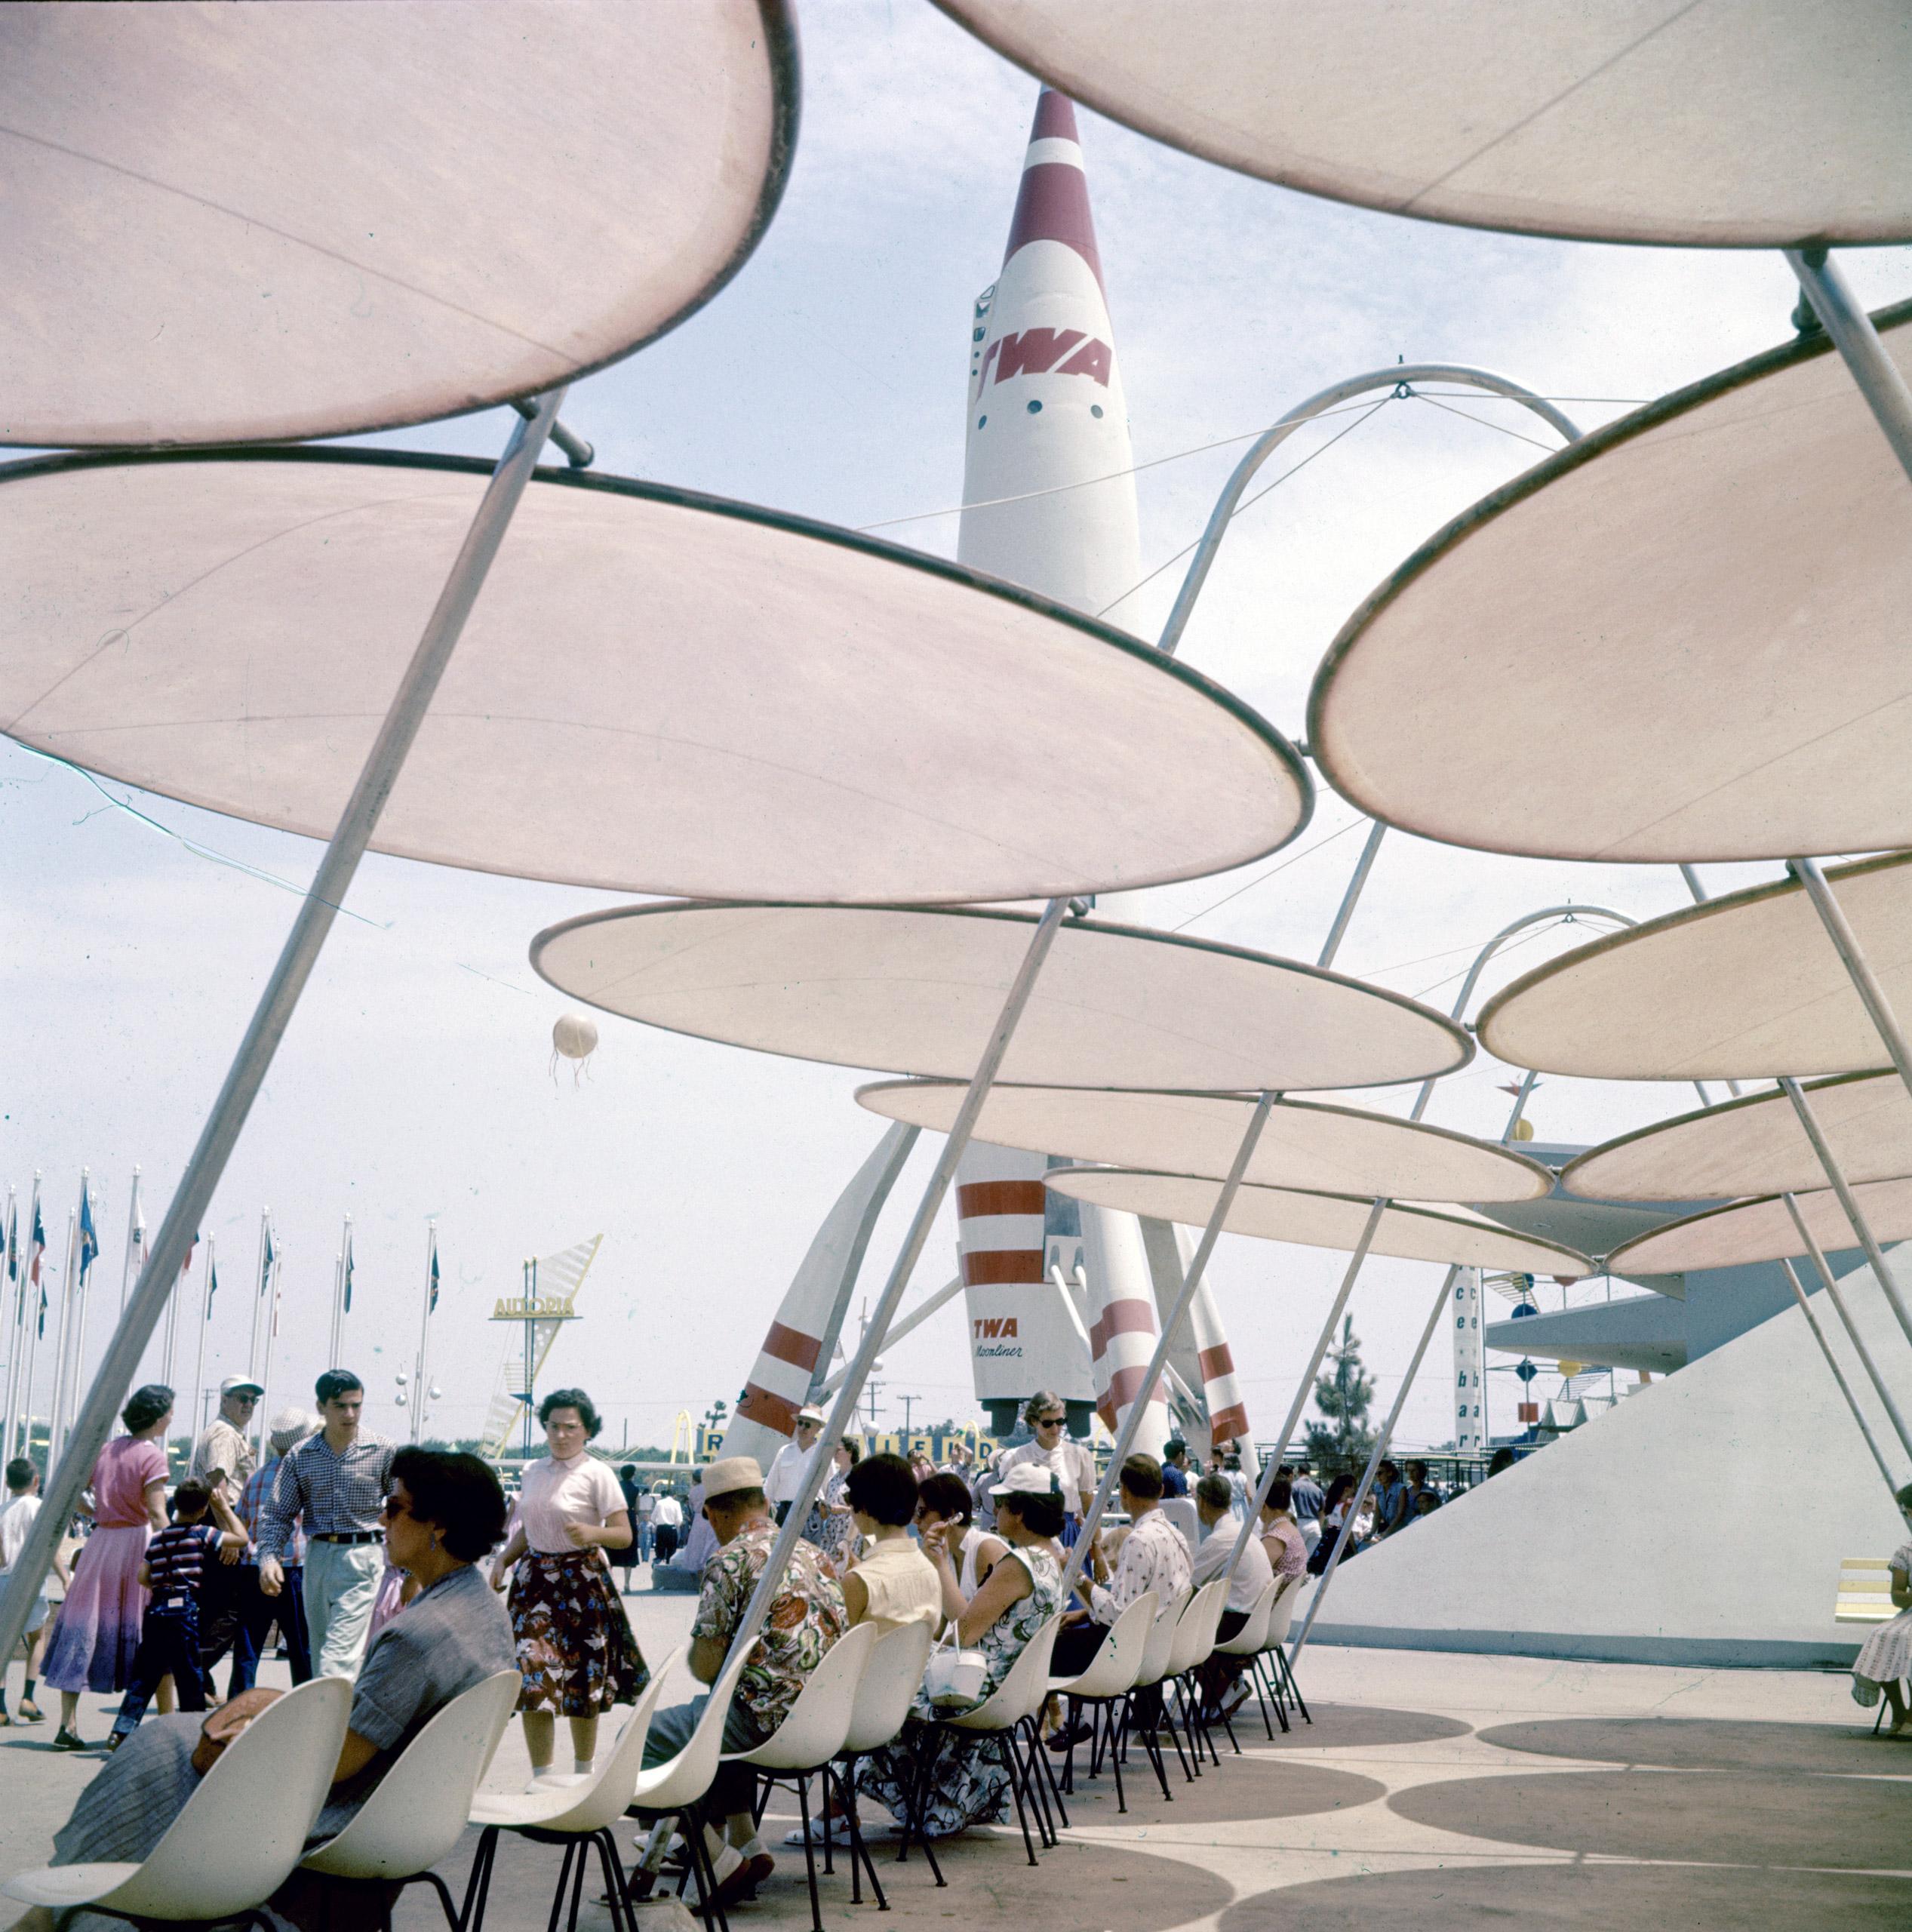 People resting by TWA rocket at Disneyland Amusement Park, 1955.